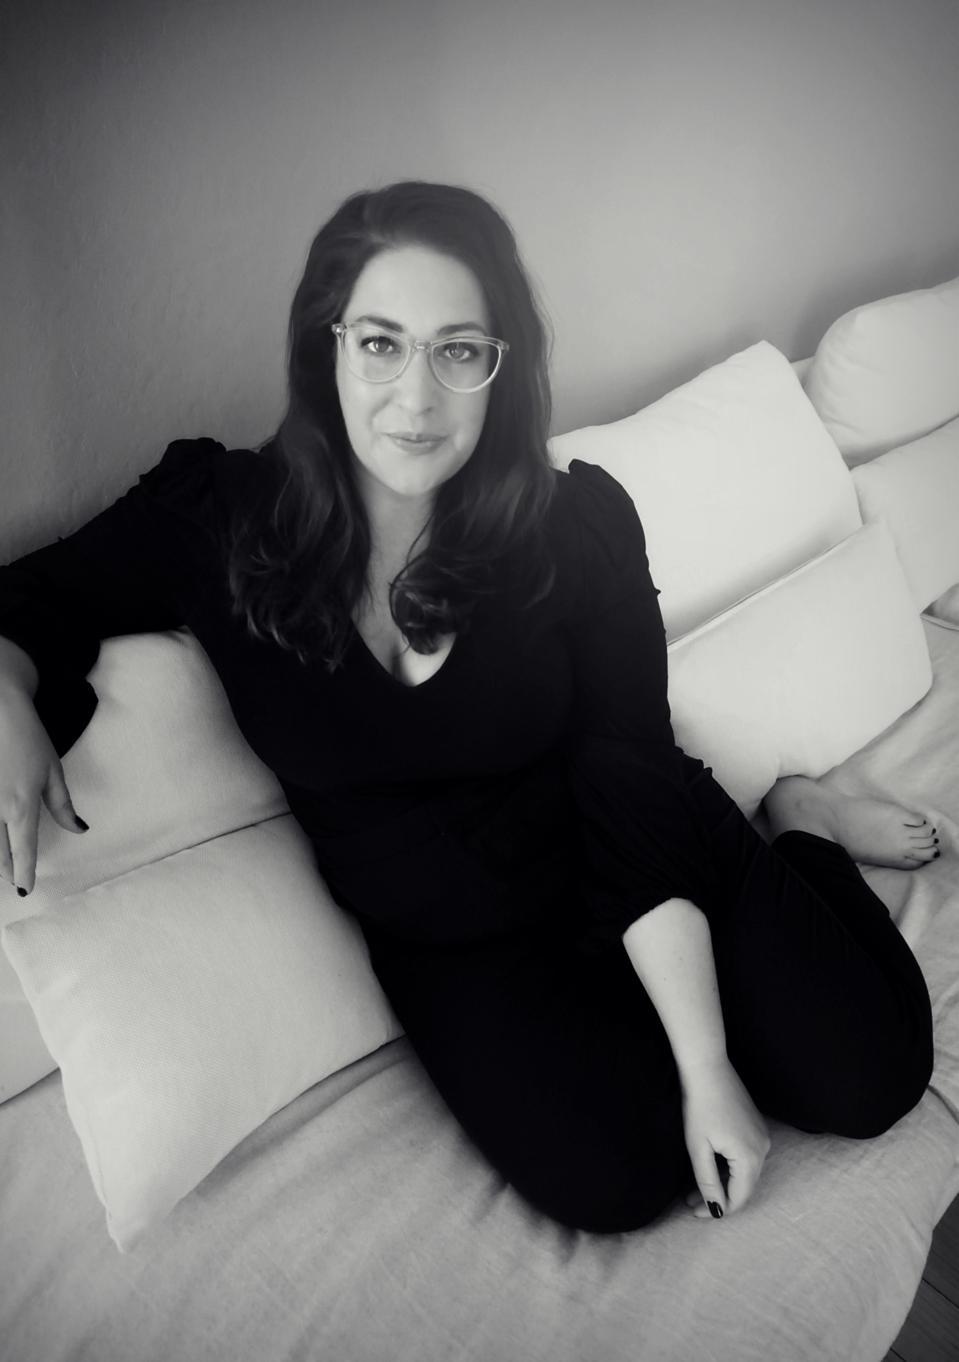 Black and white headshot of Barker sitting on a sofa